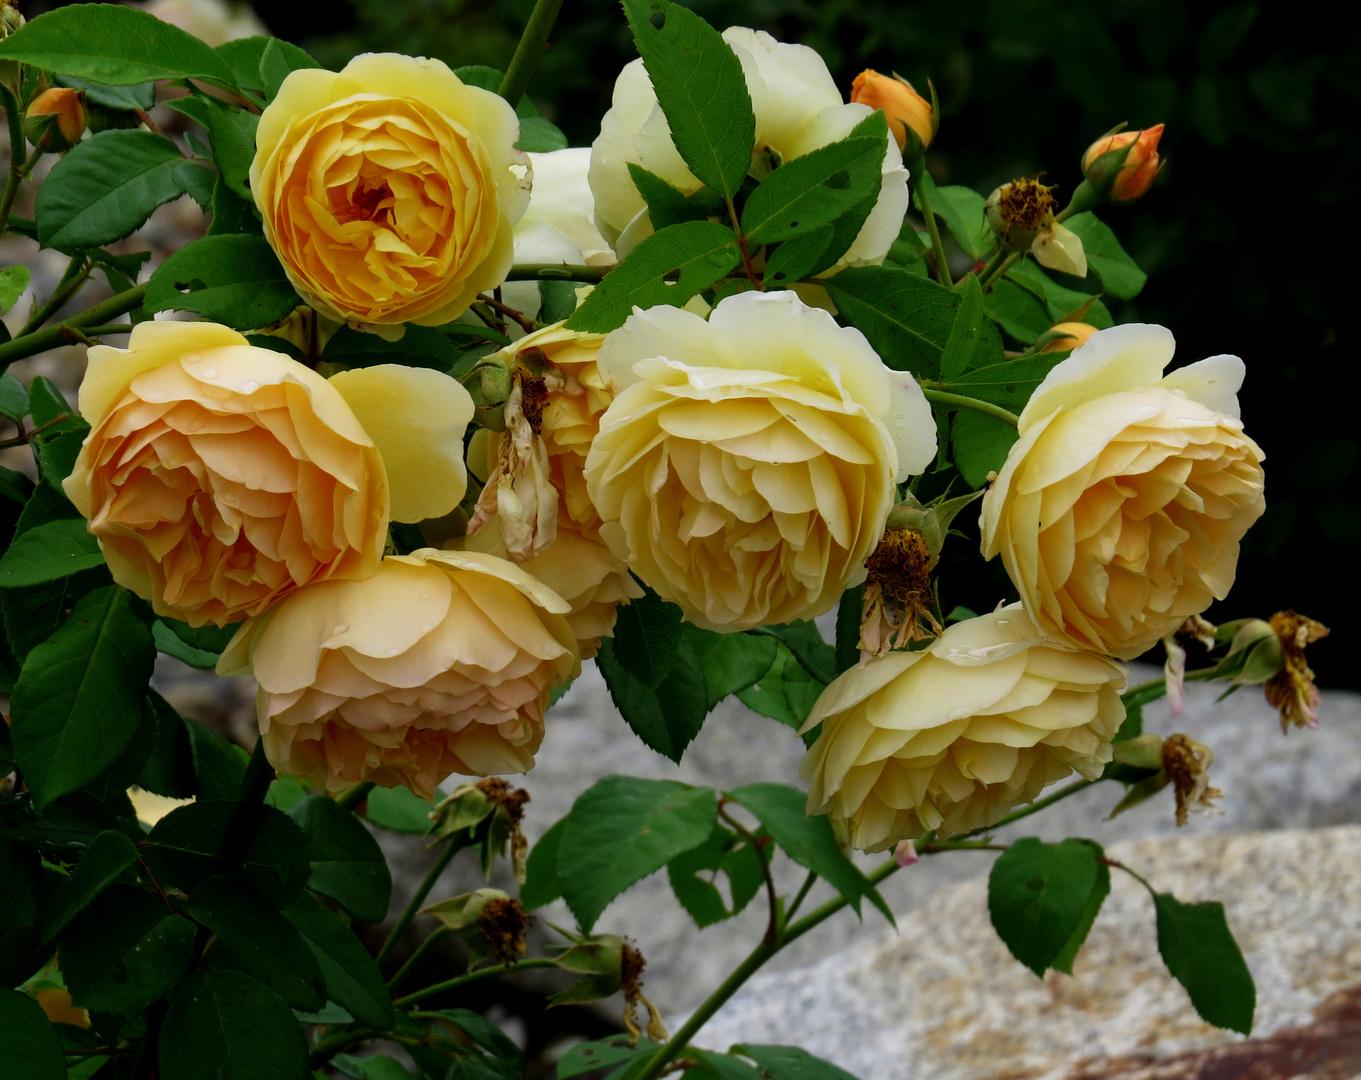 Rosen am verblühen